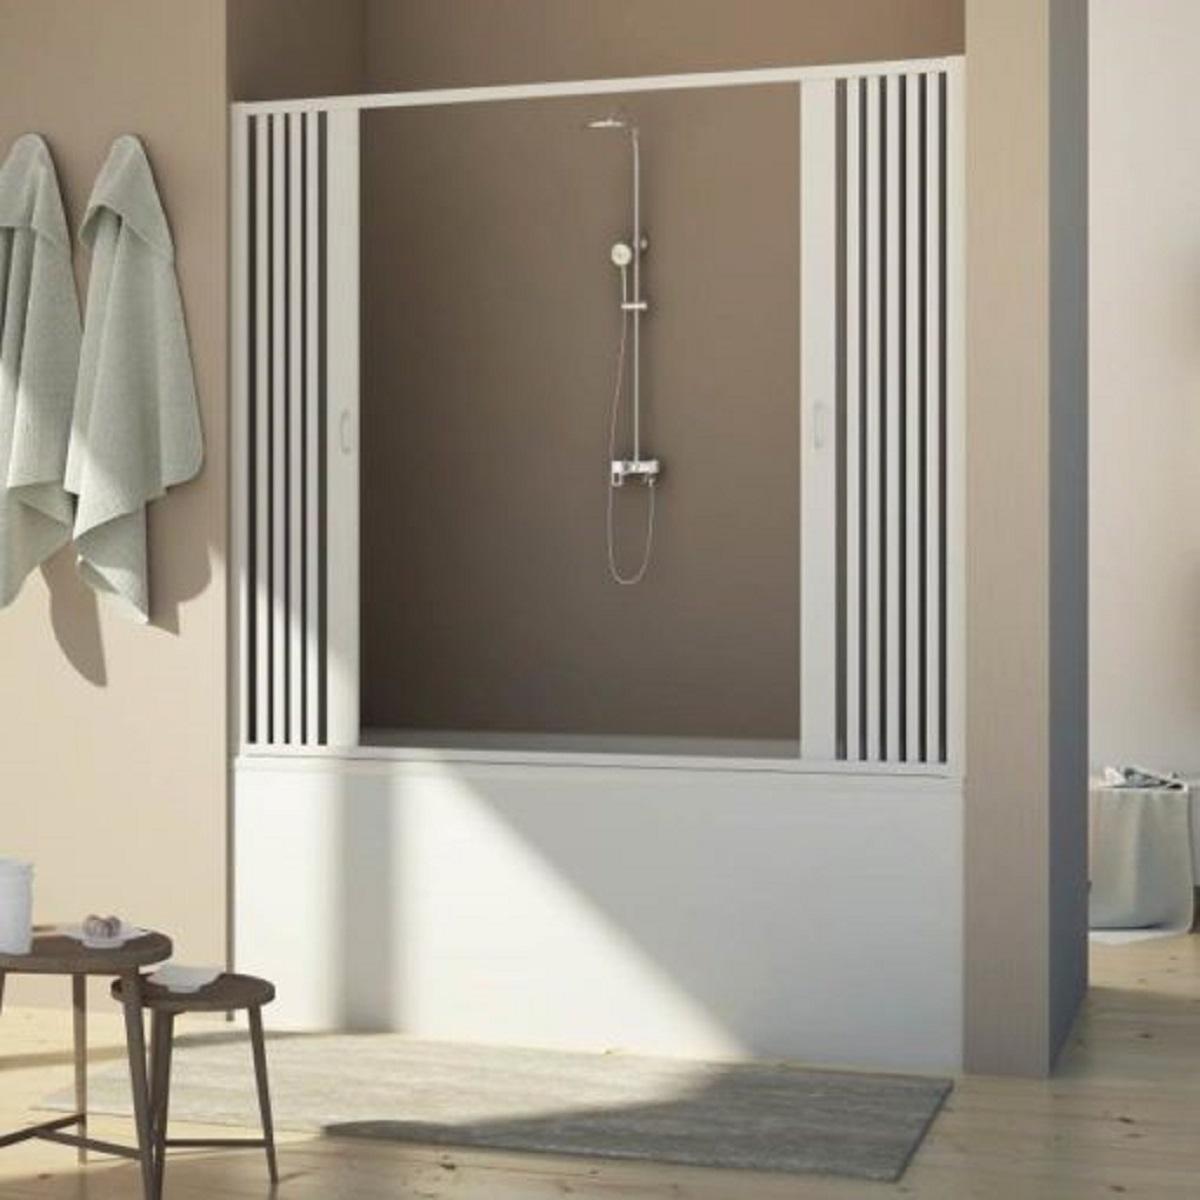 vasca-doccia-combinata-9